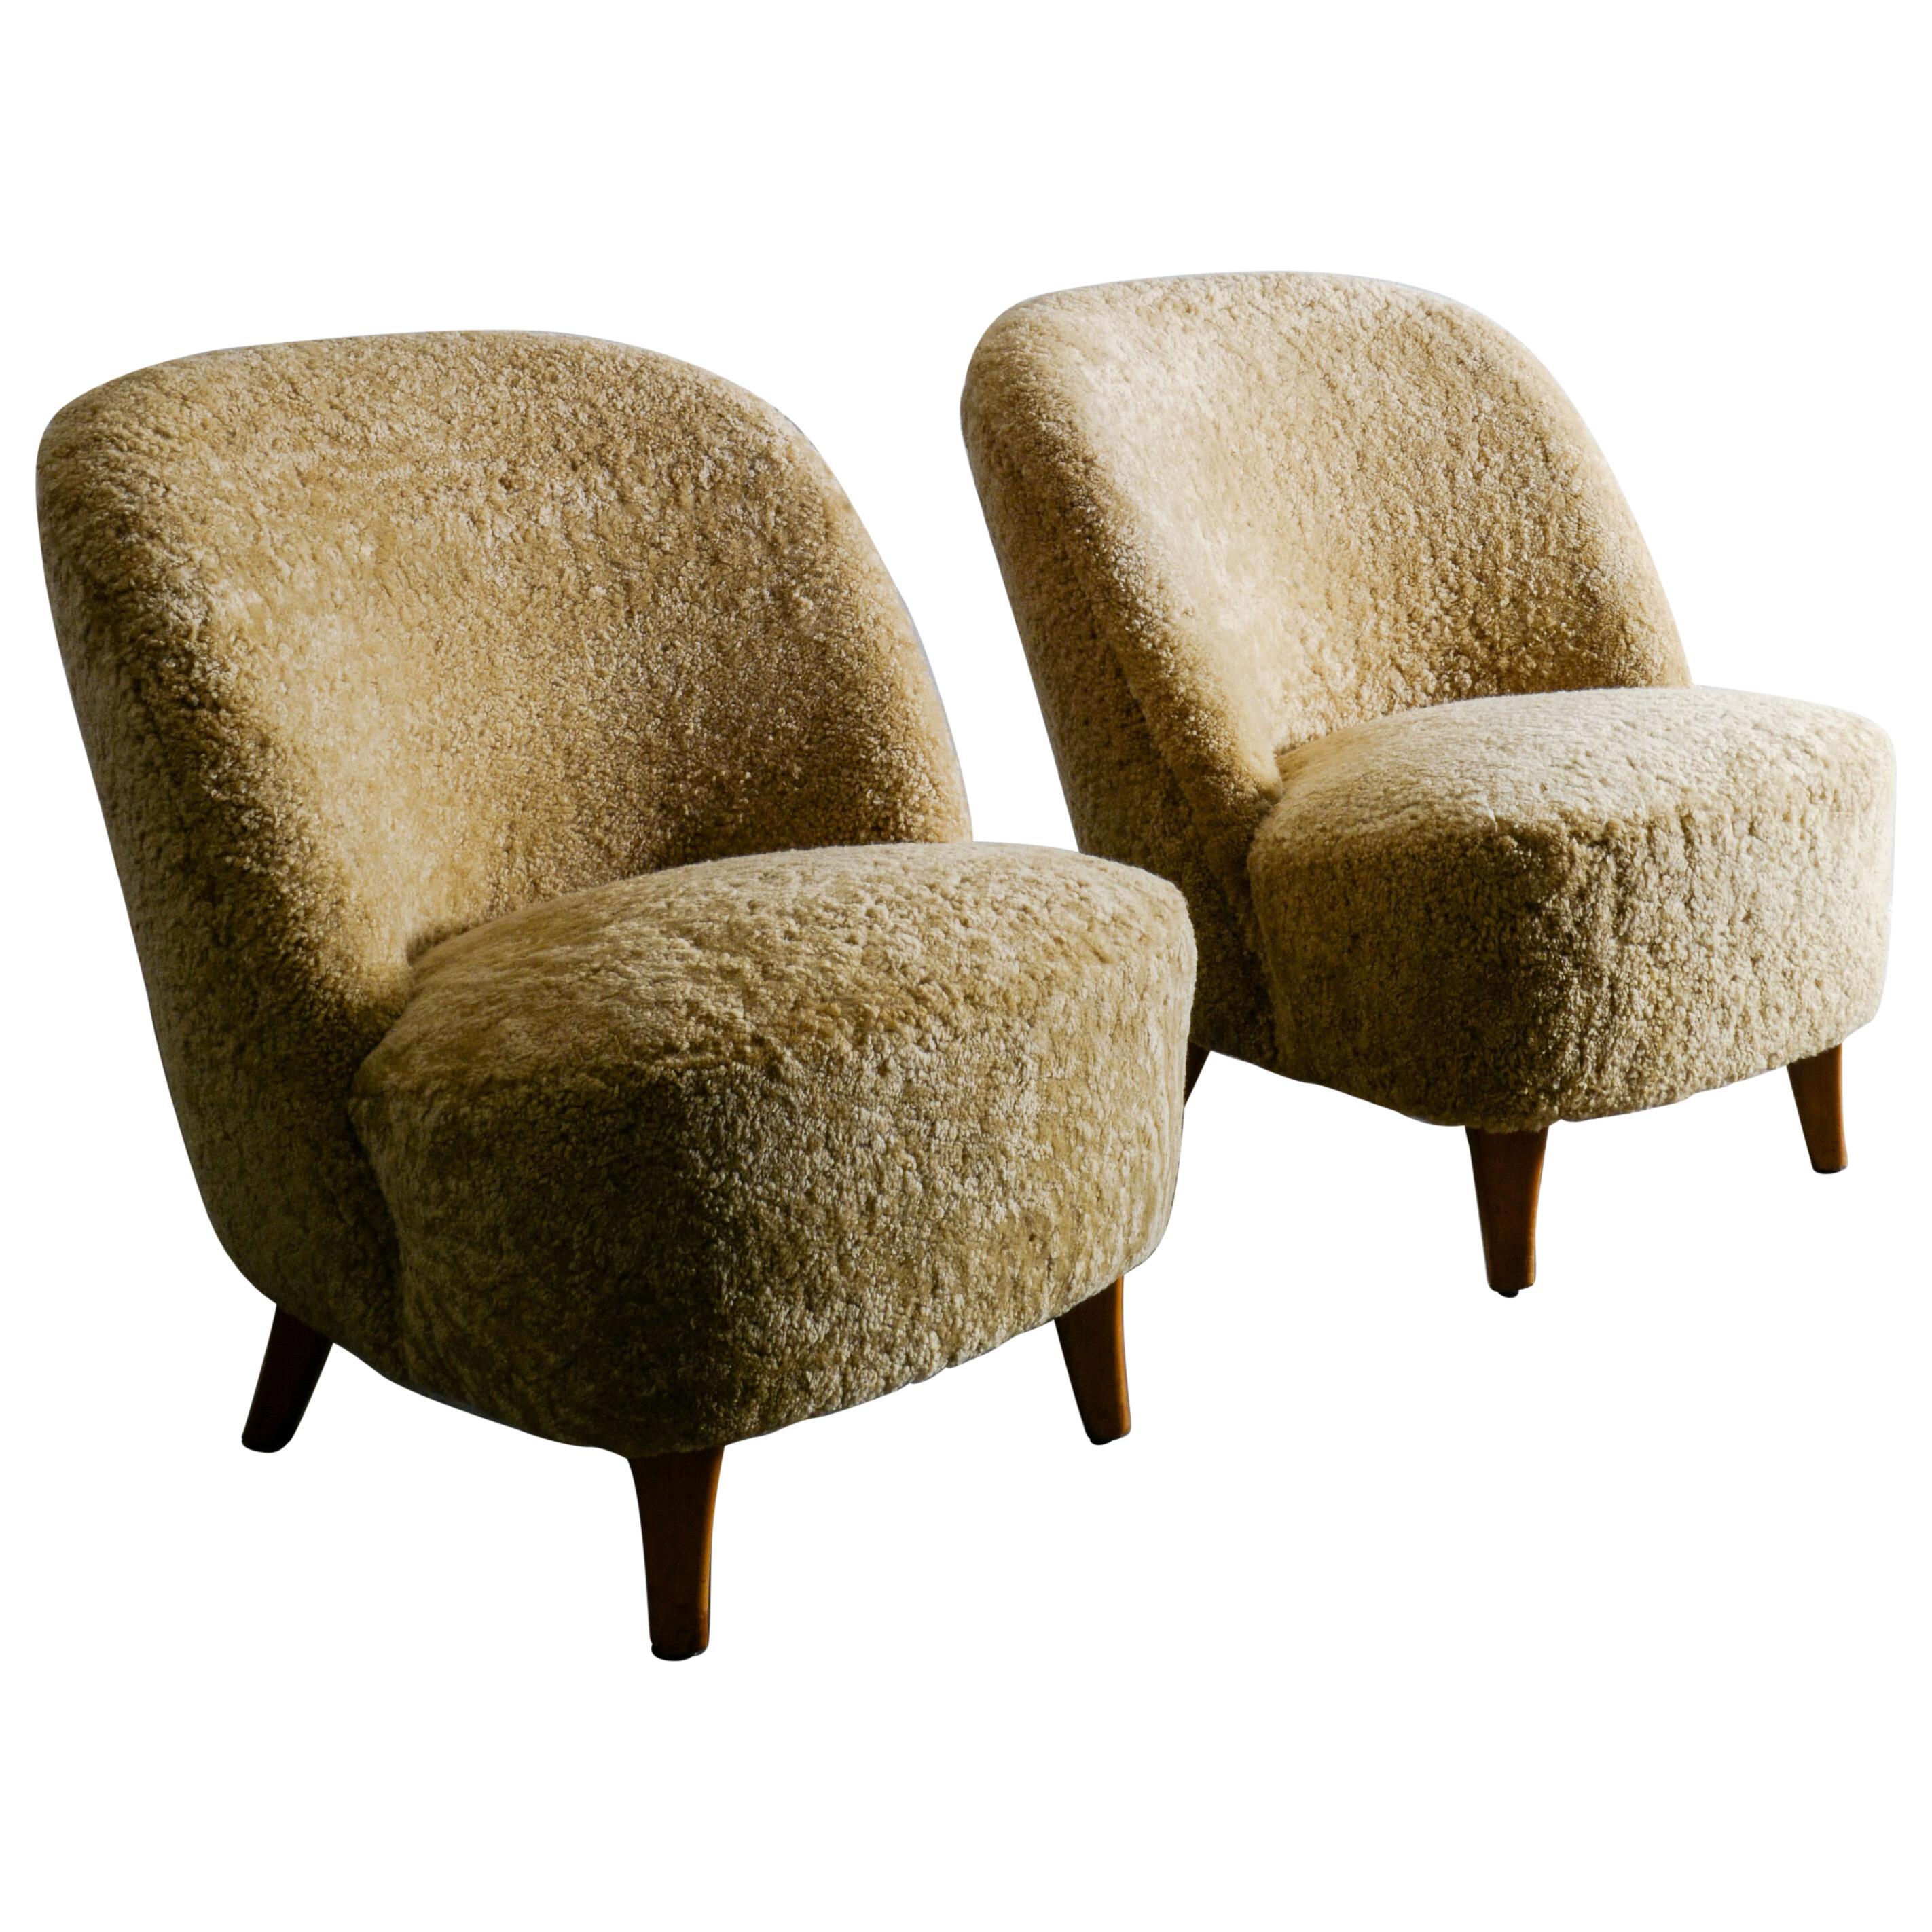 Pair of Swedish Lounge Chairs in Sheepskin, 1940s